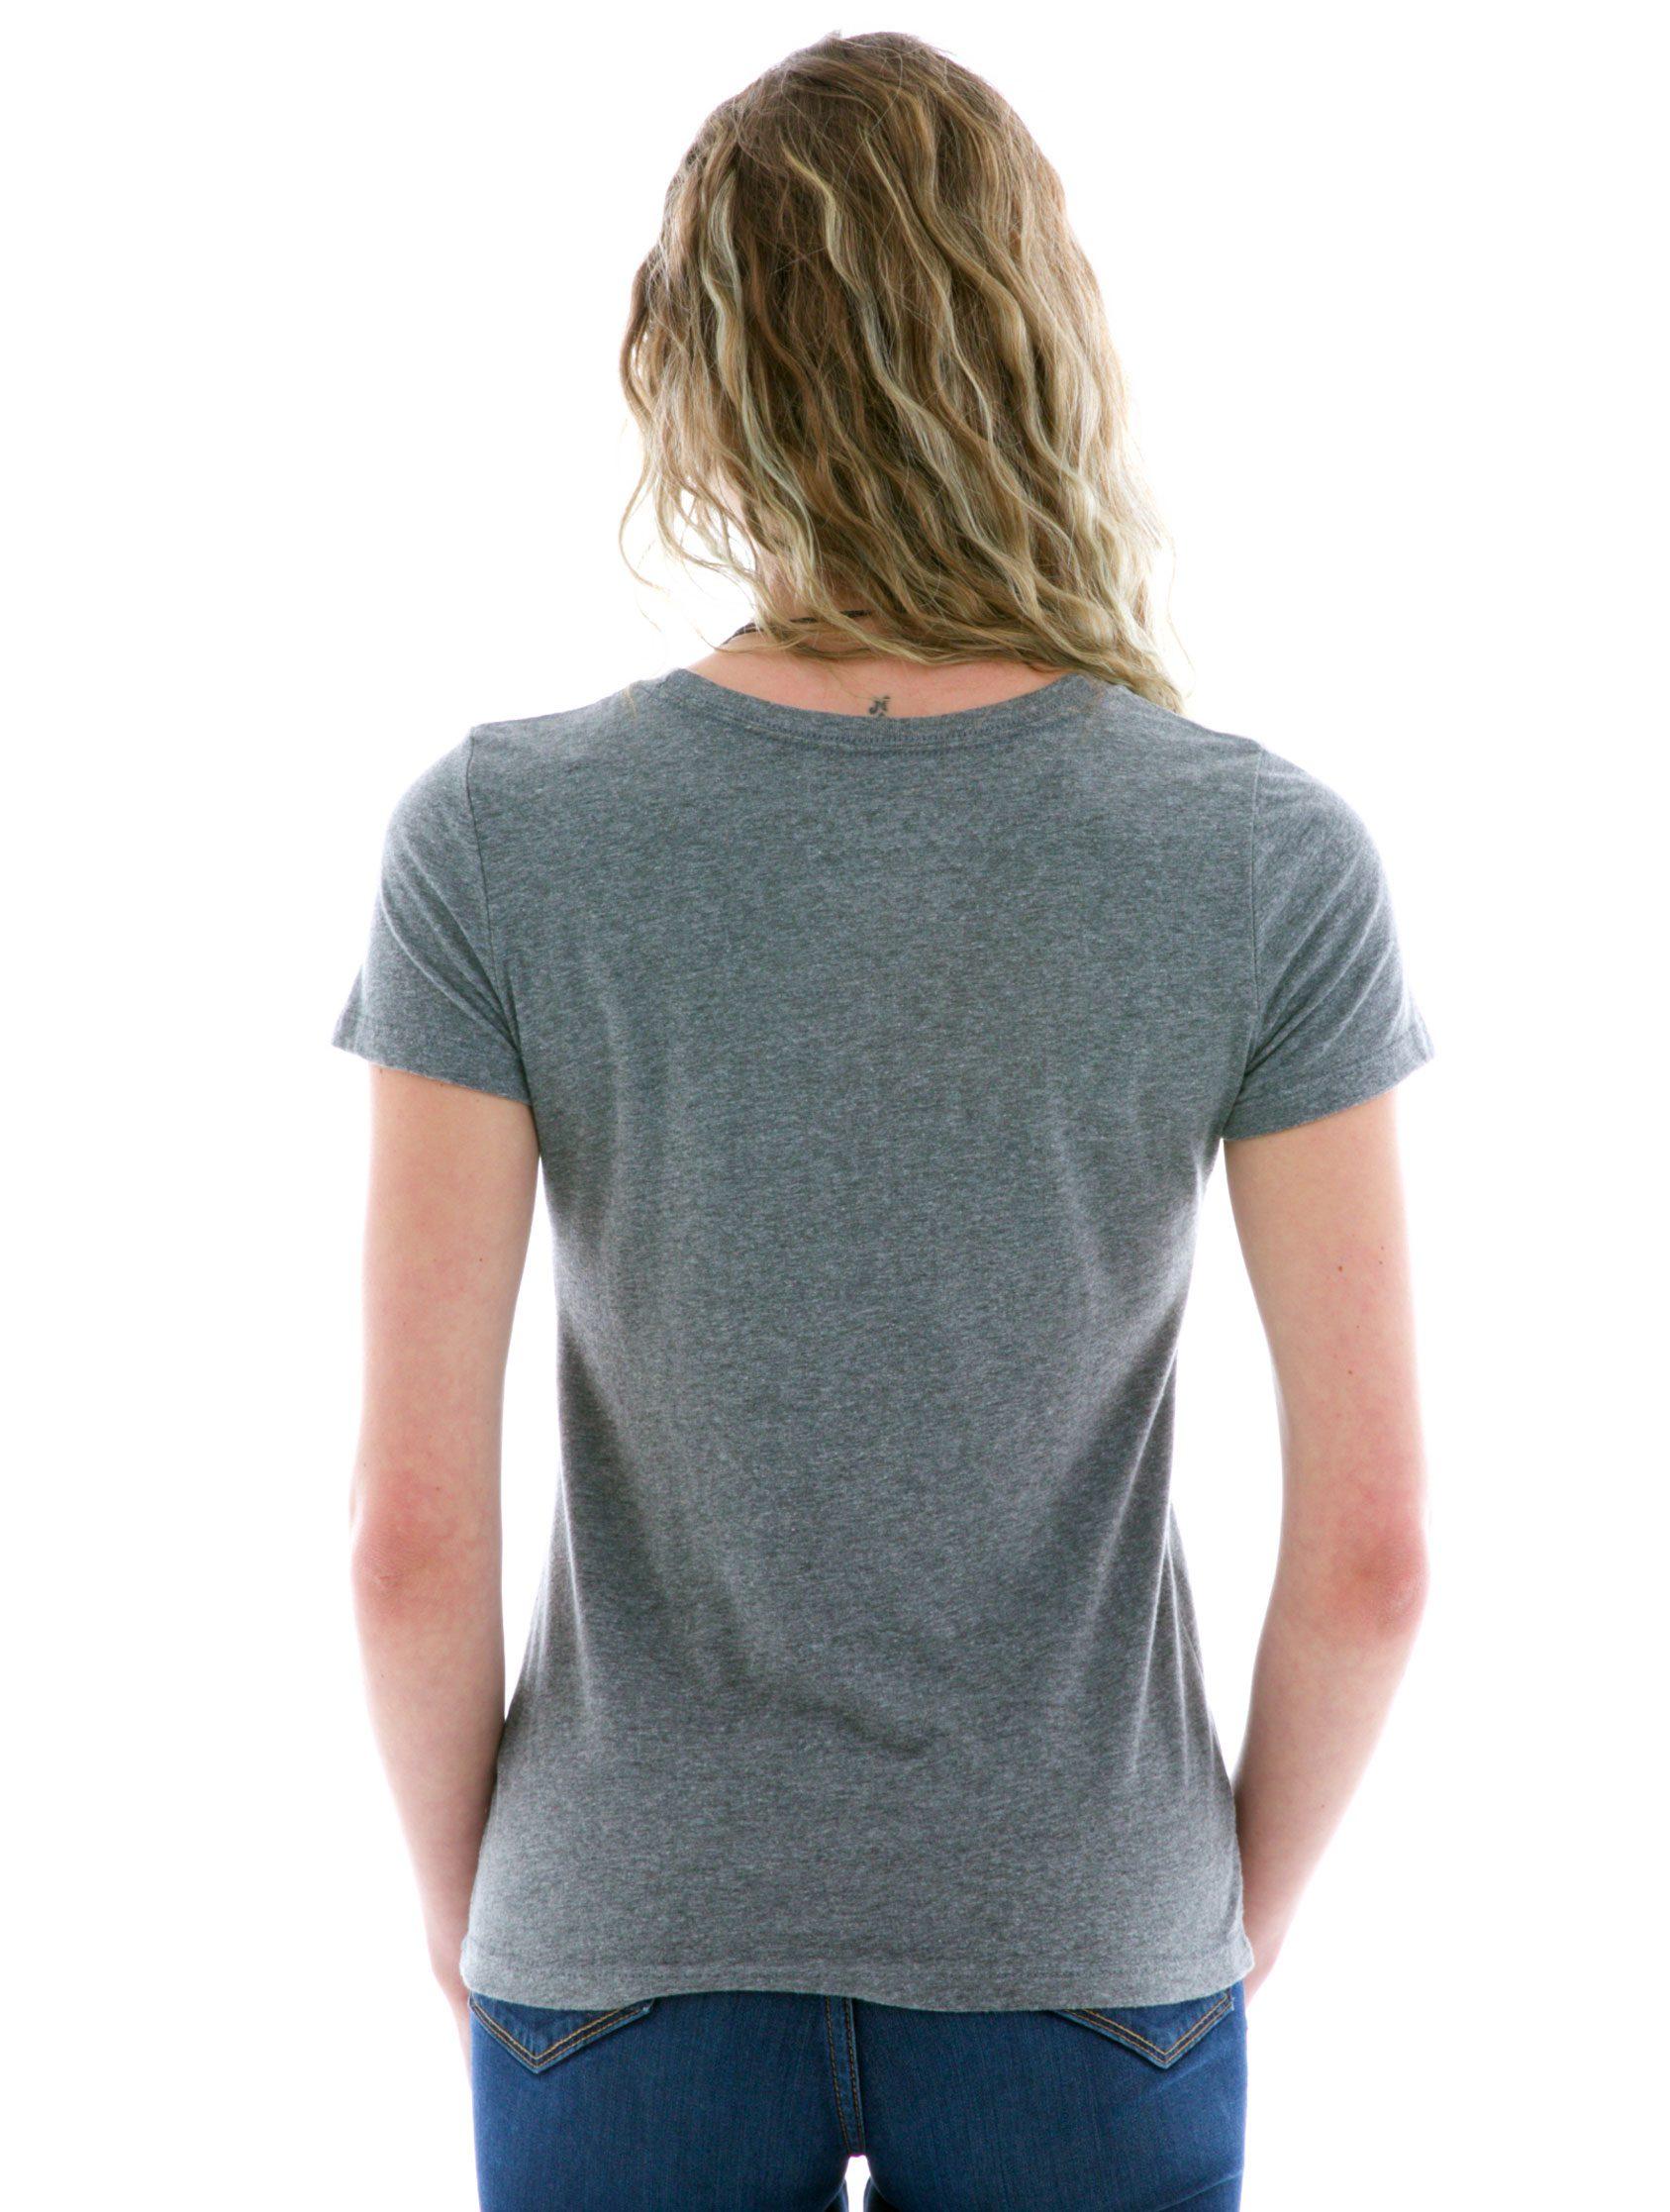 Women's Luscious Triblend Crew Short Sleeve T-Shirt